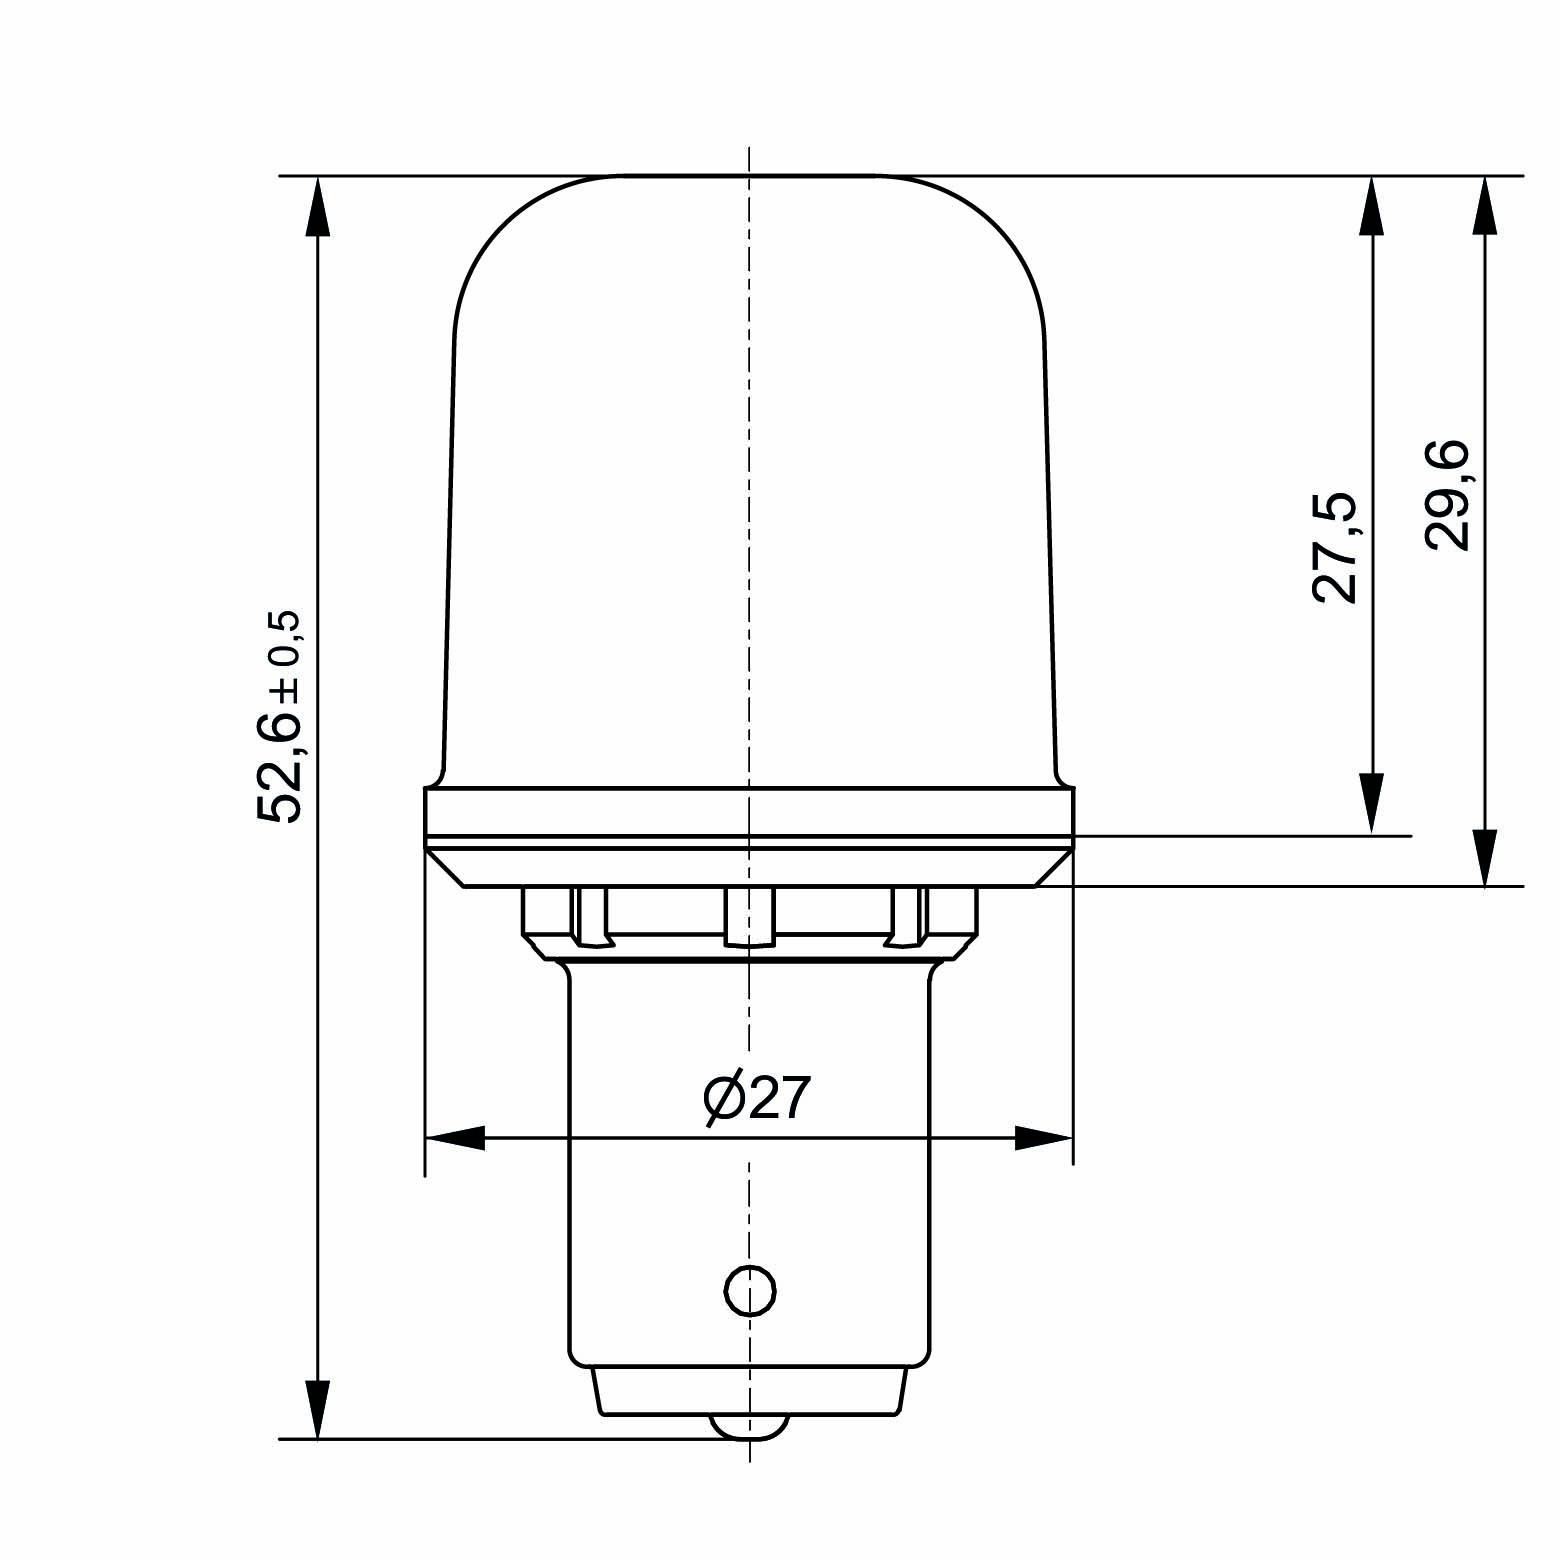 Notlicht LED-Lampe Sistar® 3L Sockel BA15s - plan